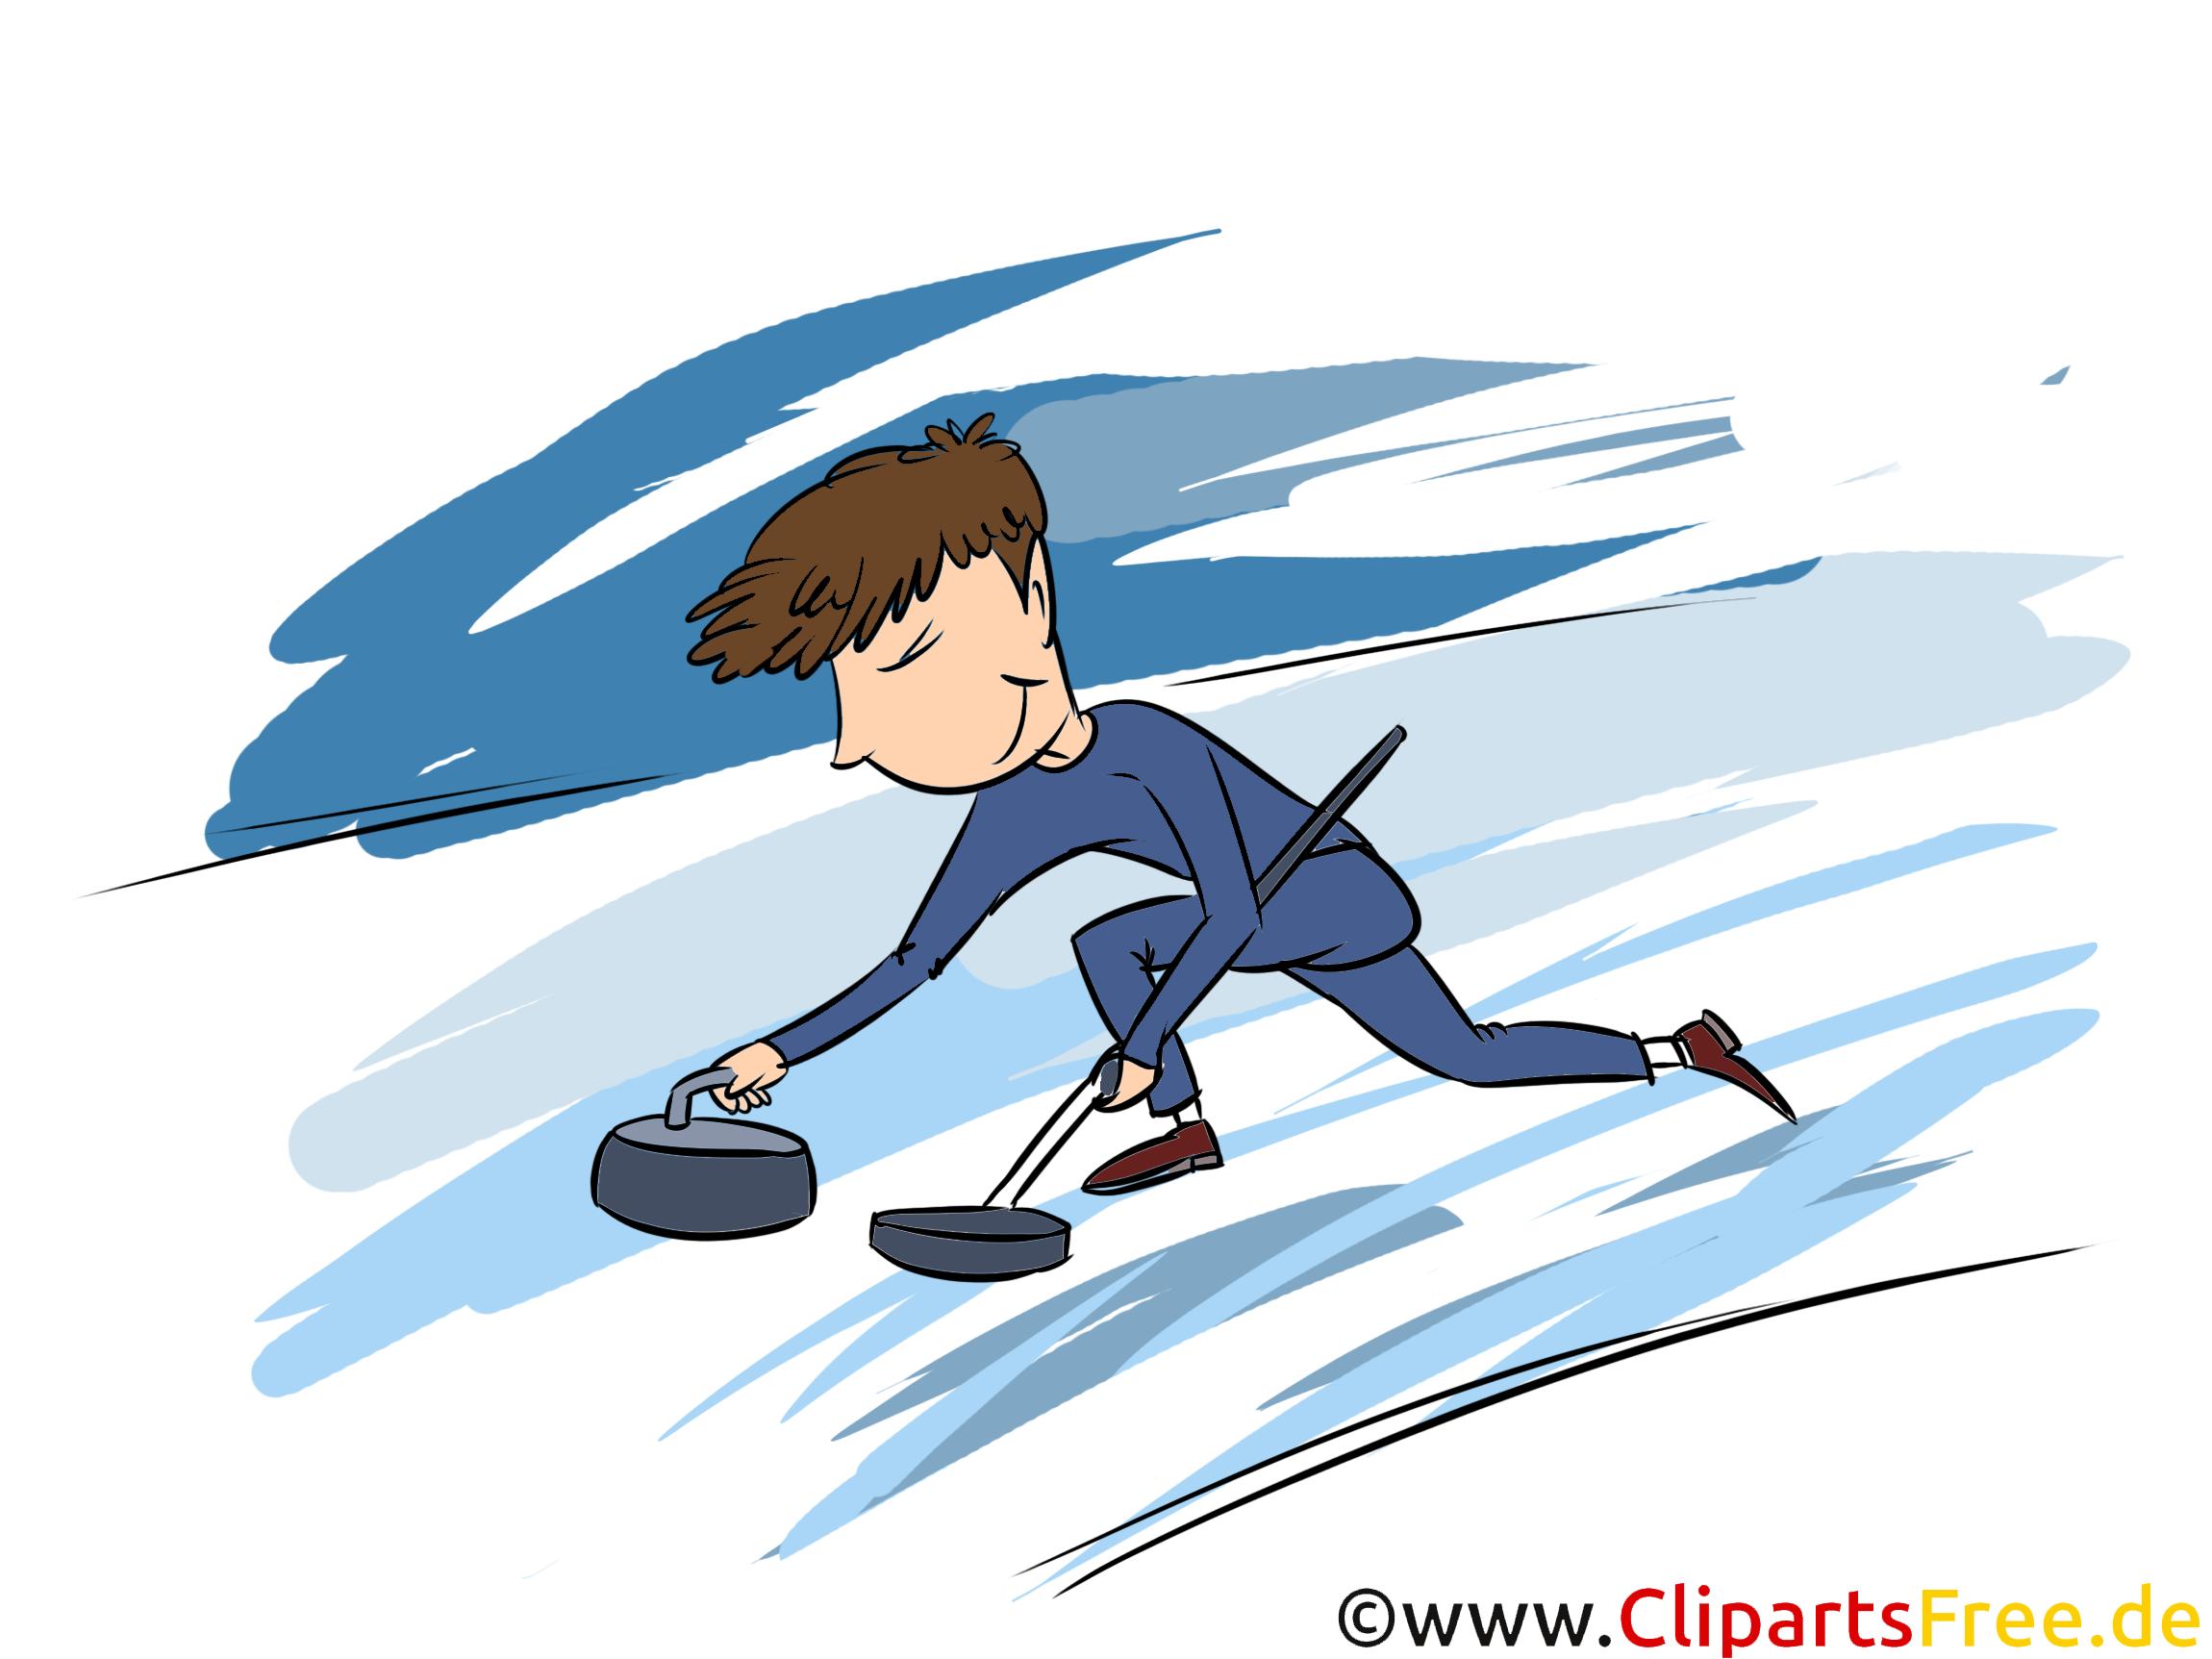 Curling Clipart, Bild, Illustration - Wintersportarten Bilder